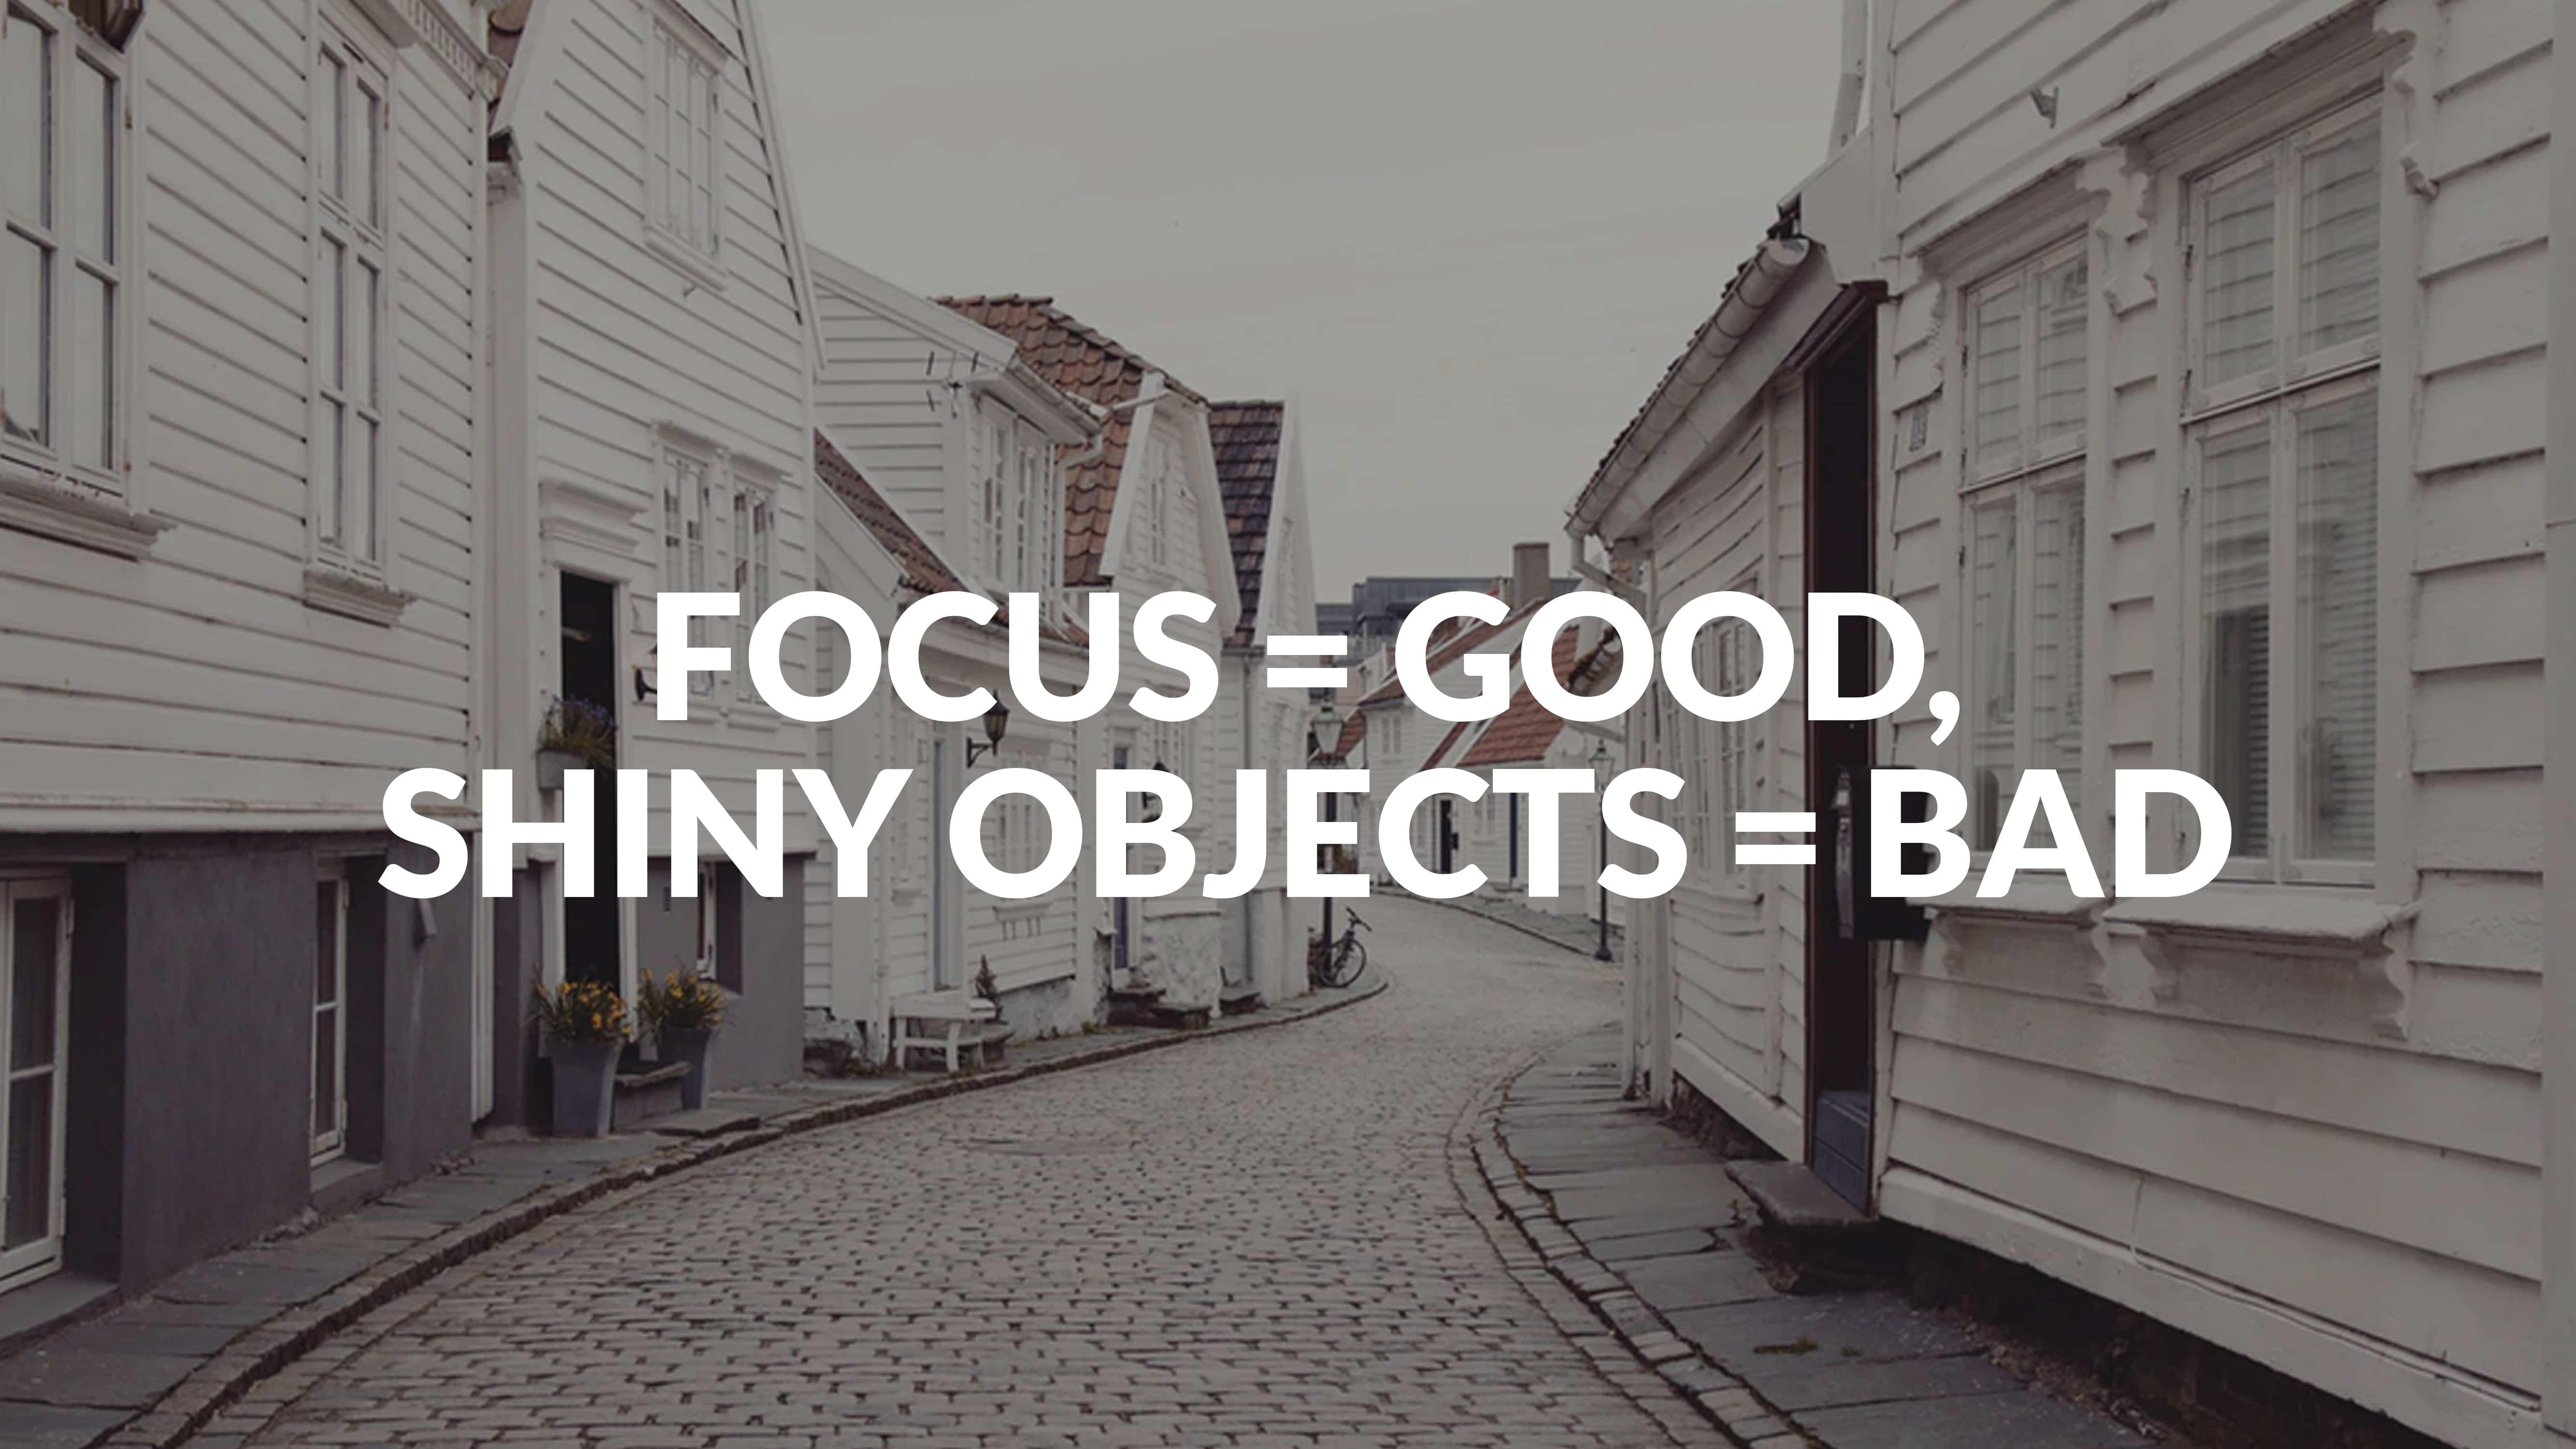 Focus = good, shiny objects = bad